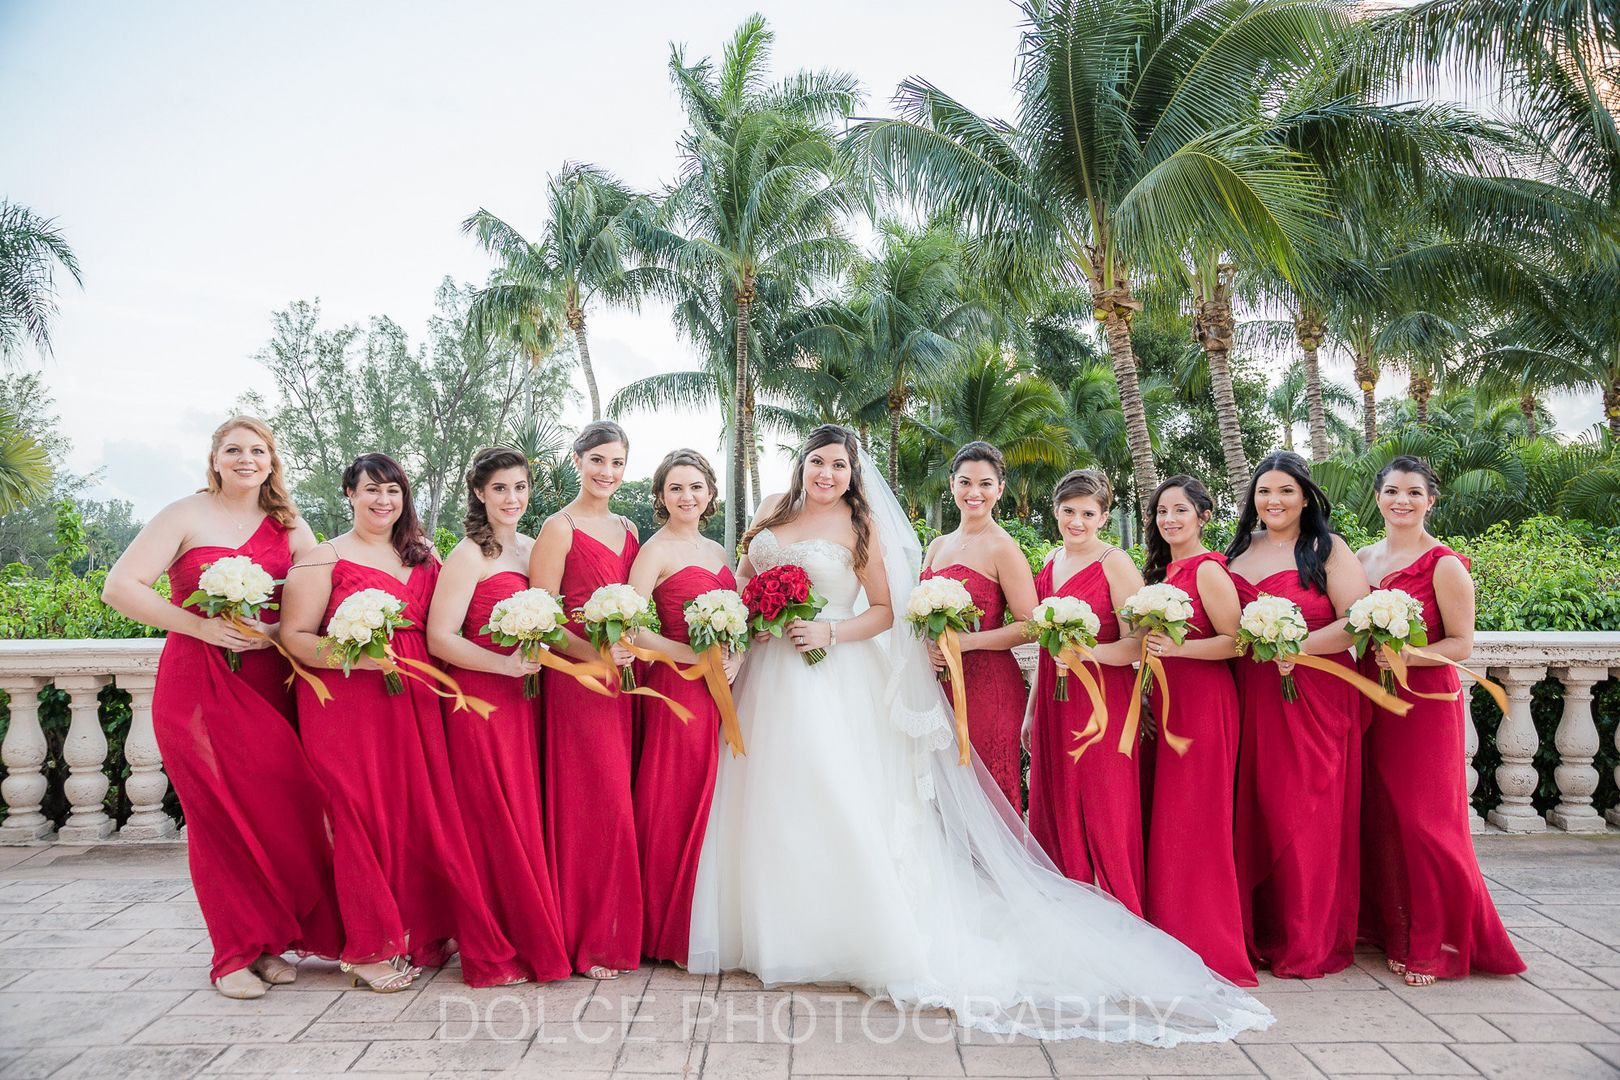 IMG_0120 - biltmore miami wedding.jpg